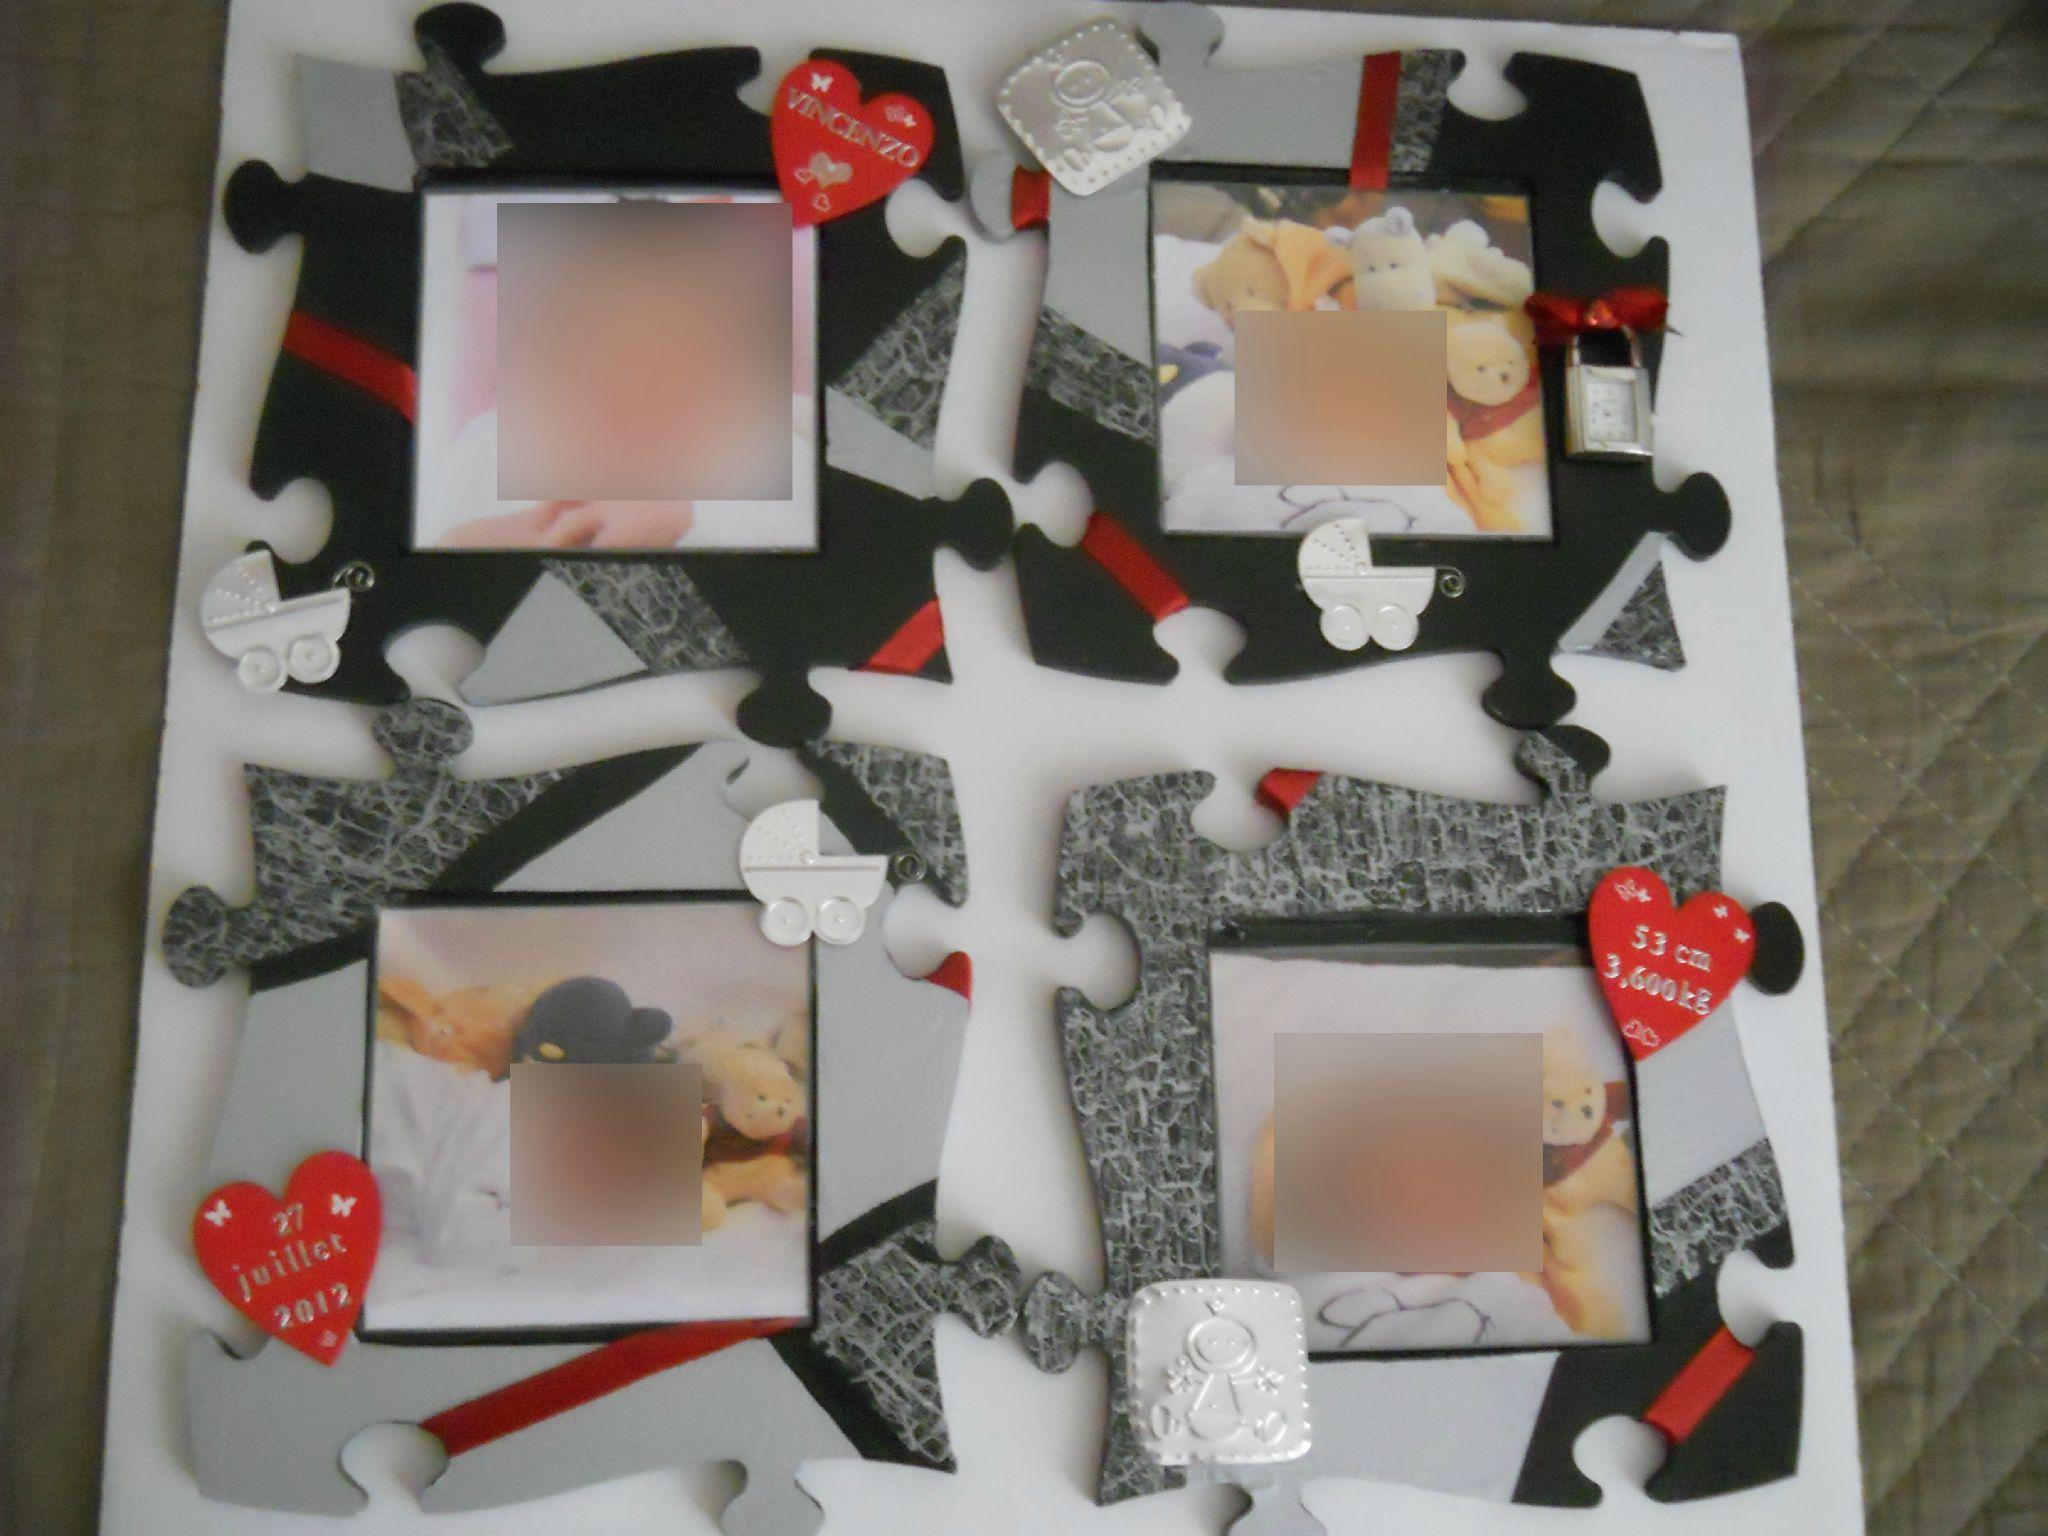 cadre personnalis album photos les gourmandises et cr ations de sandrine. Black Bedroom Furniture Sets. Home Design Ideas